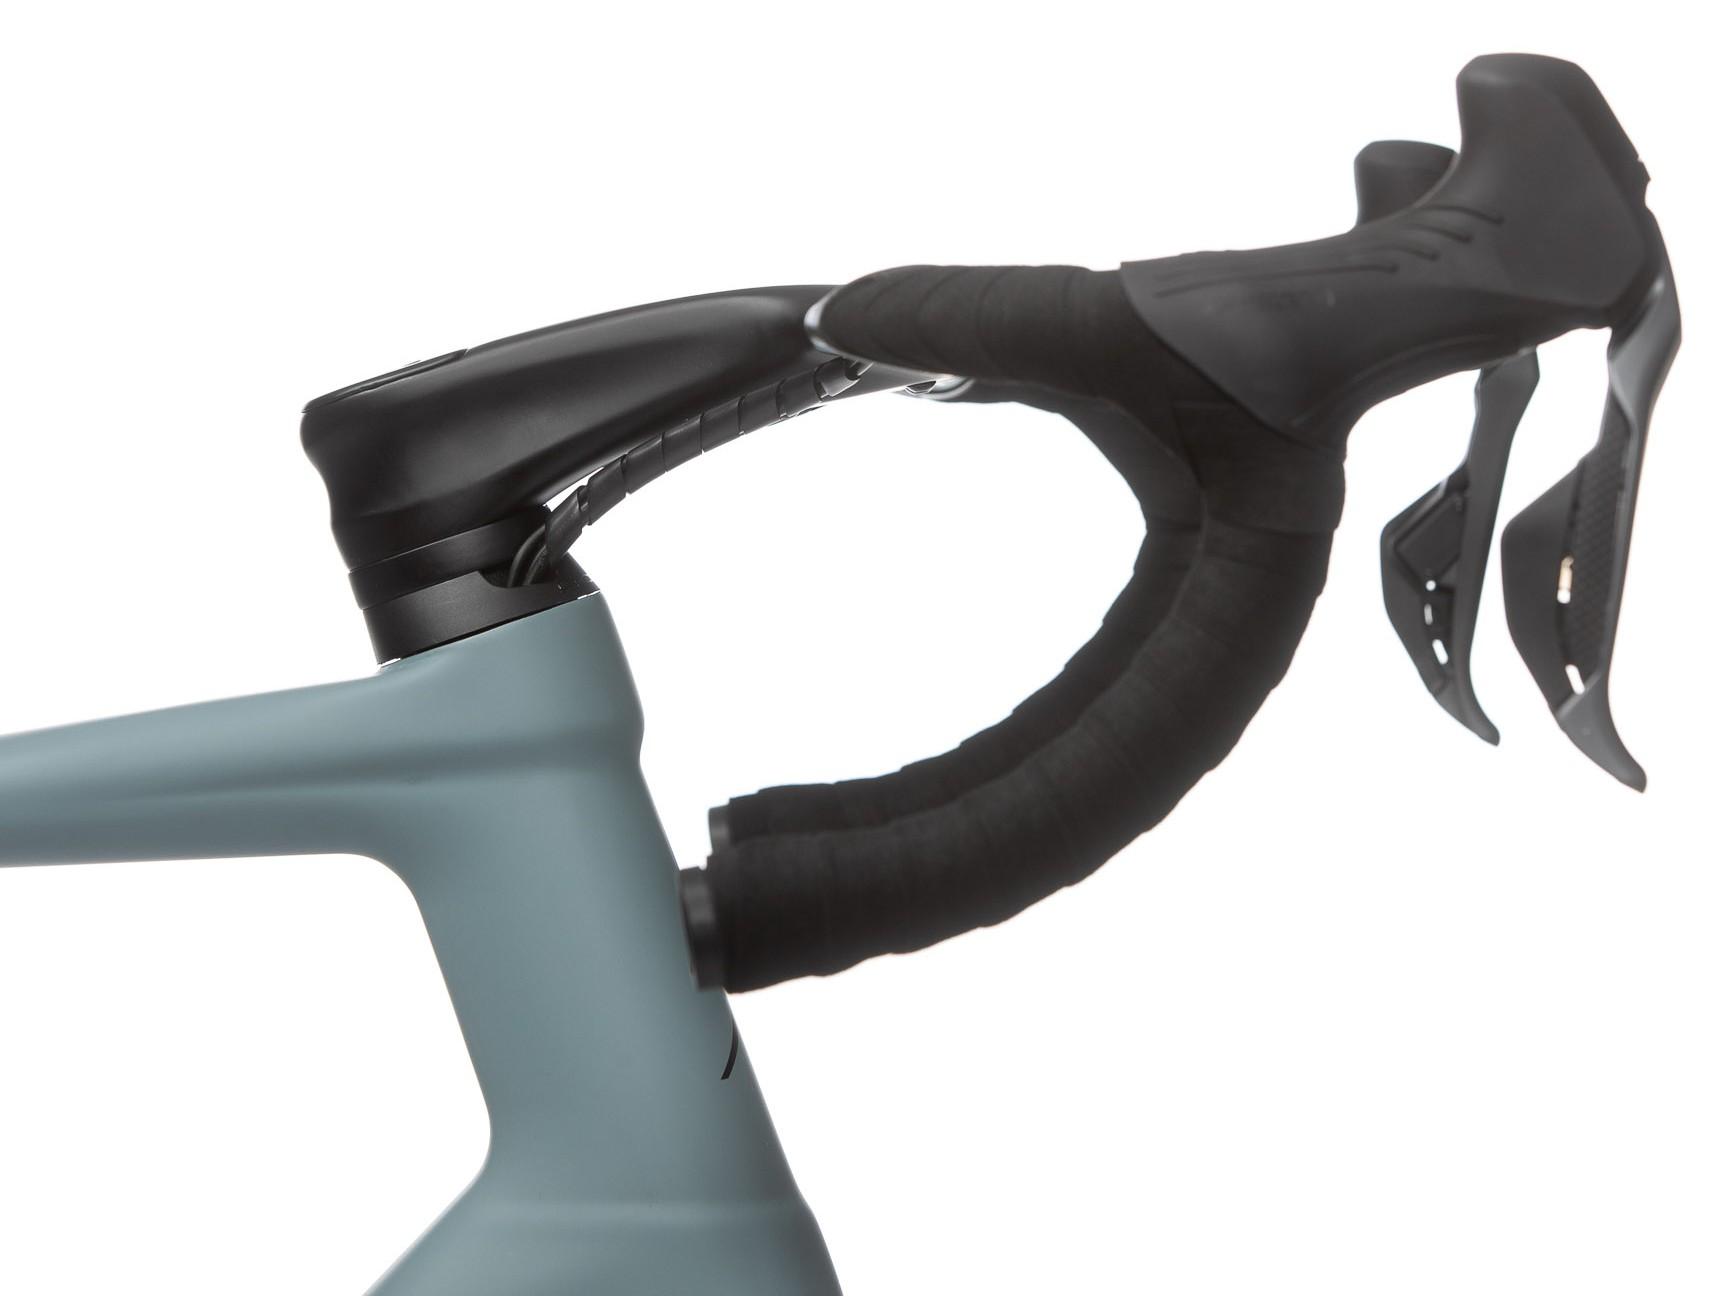 Simplons handlebar/stem unit ARC1 in 120 mm x 400 mm